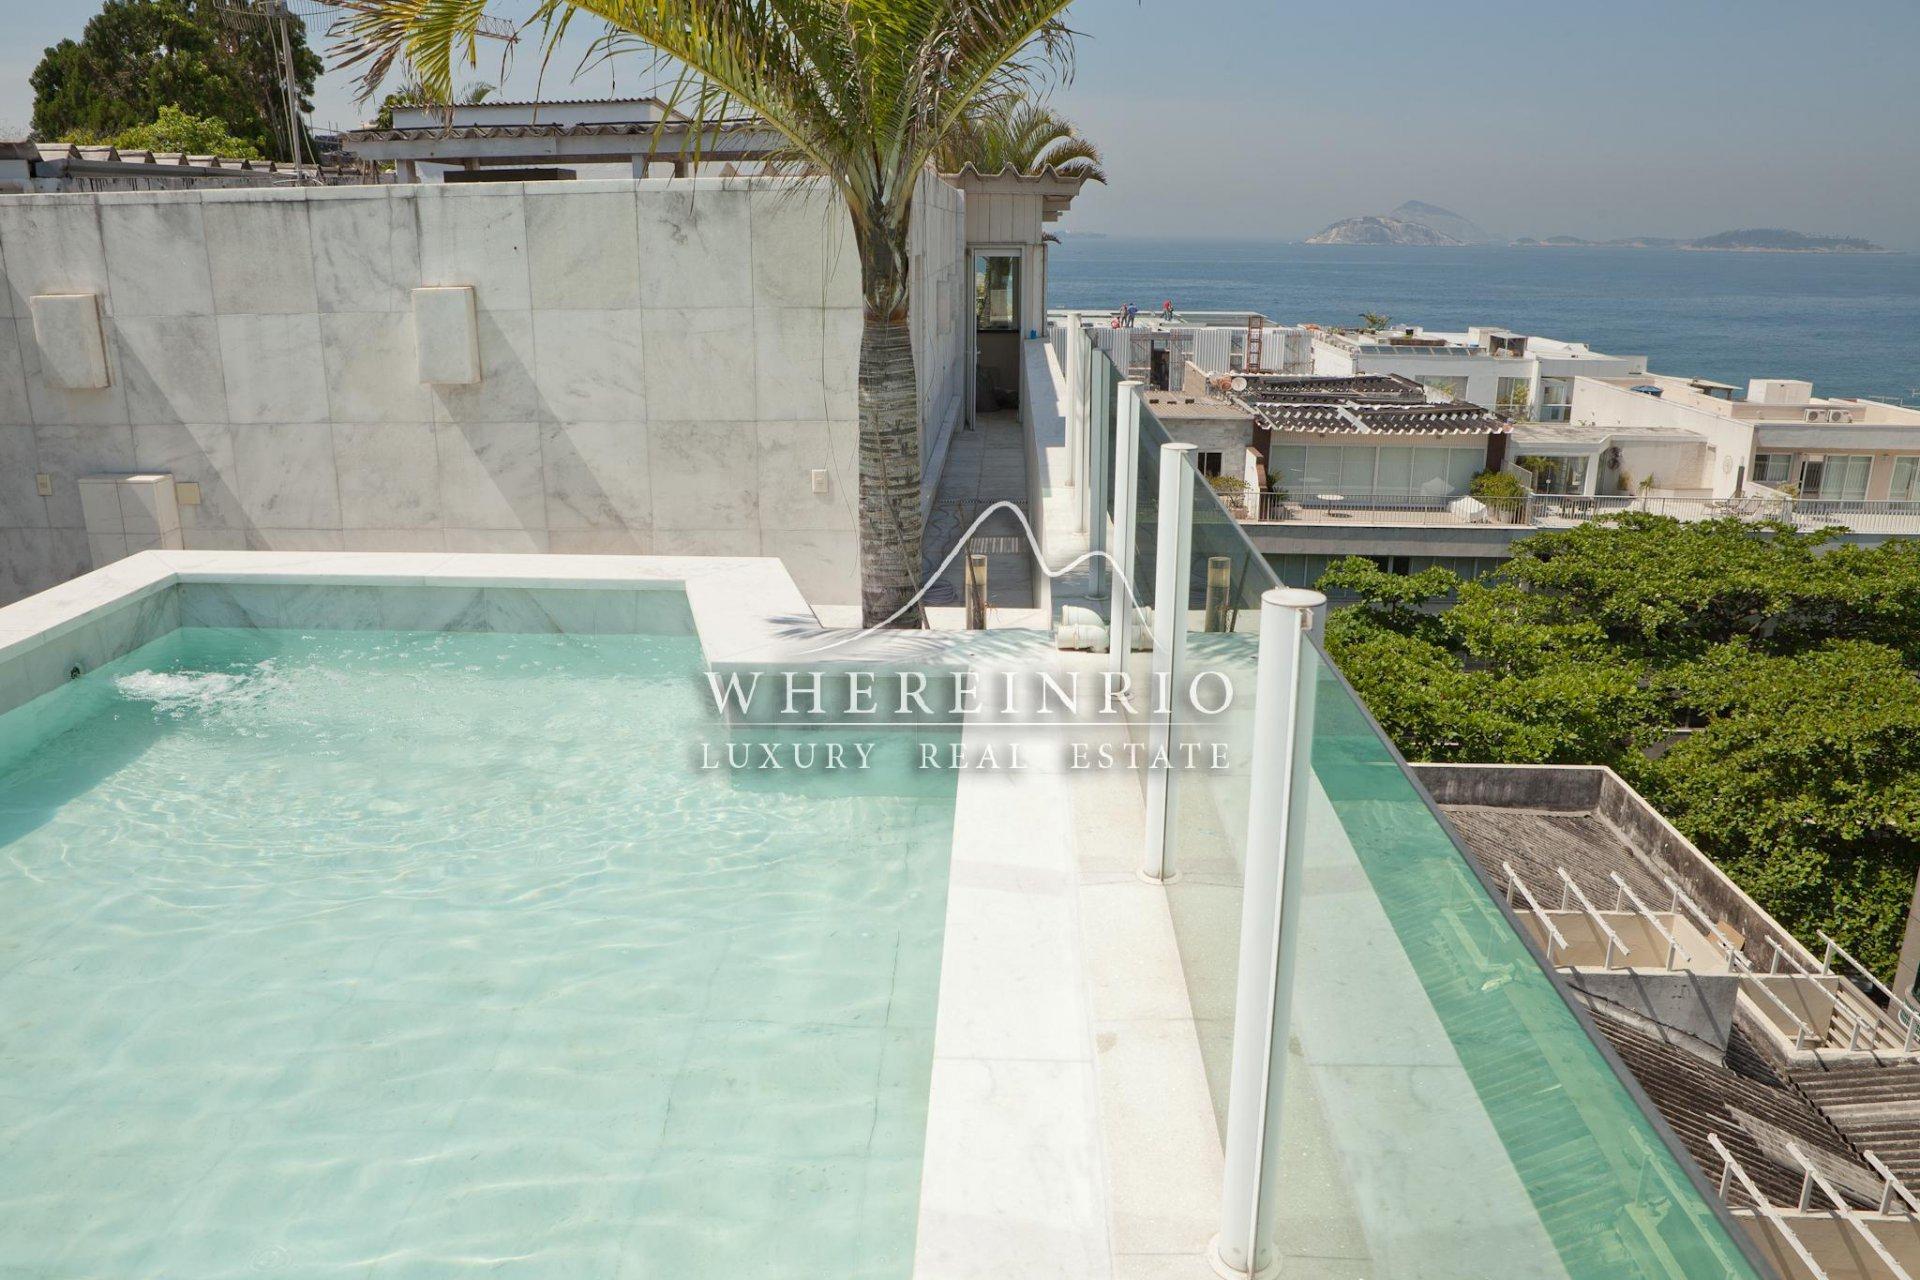 Wohnung in Copacabana, Rio de Janeiro, Brasilien 1